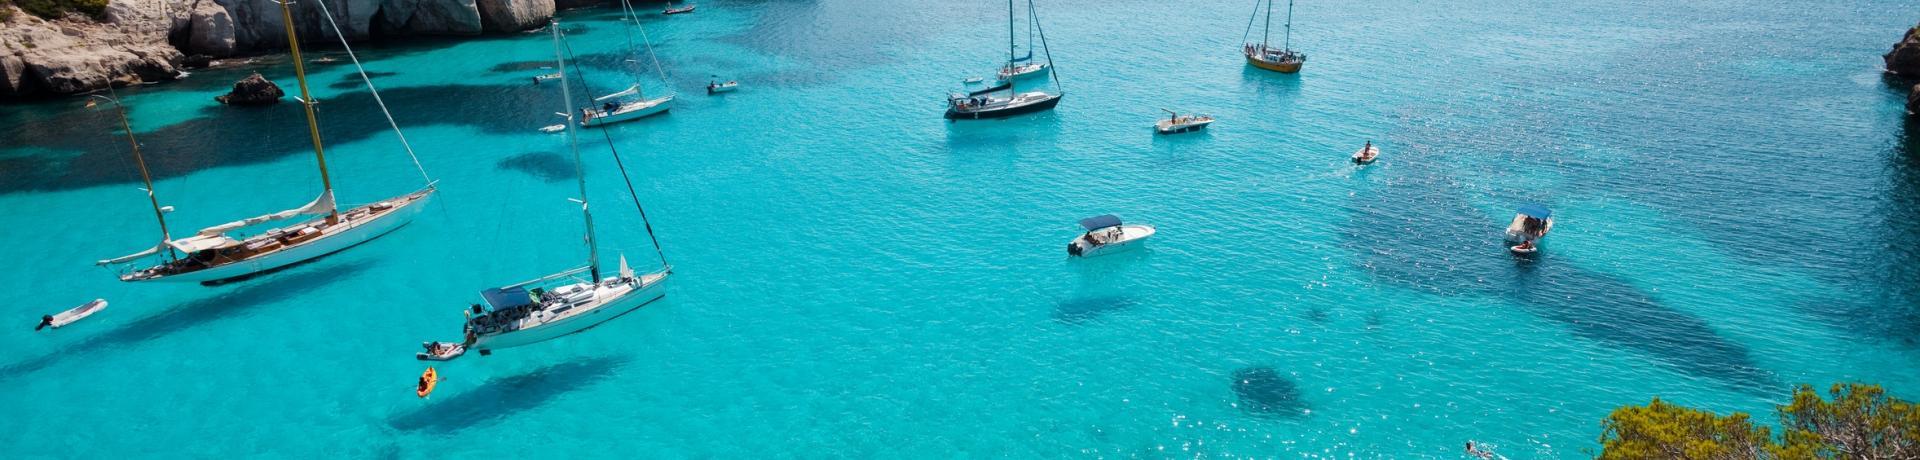 283+Spanien+Menorca+FO-45042806.jpg